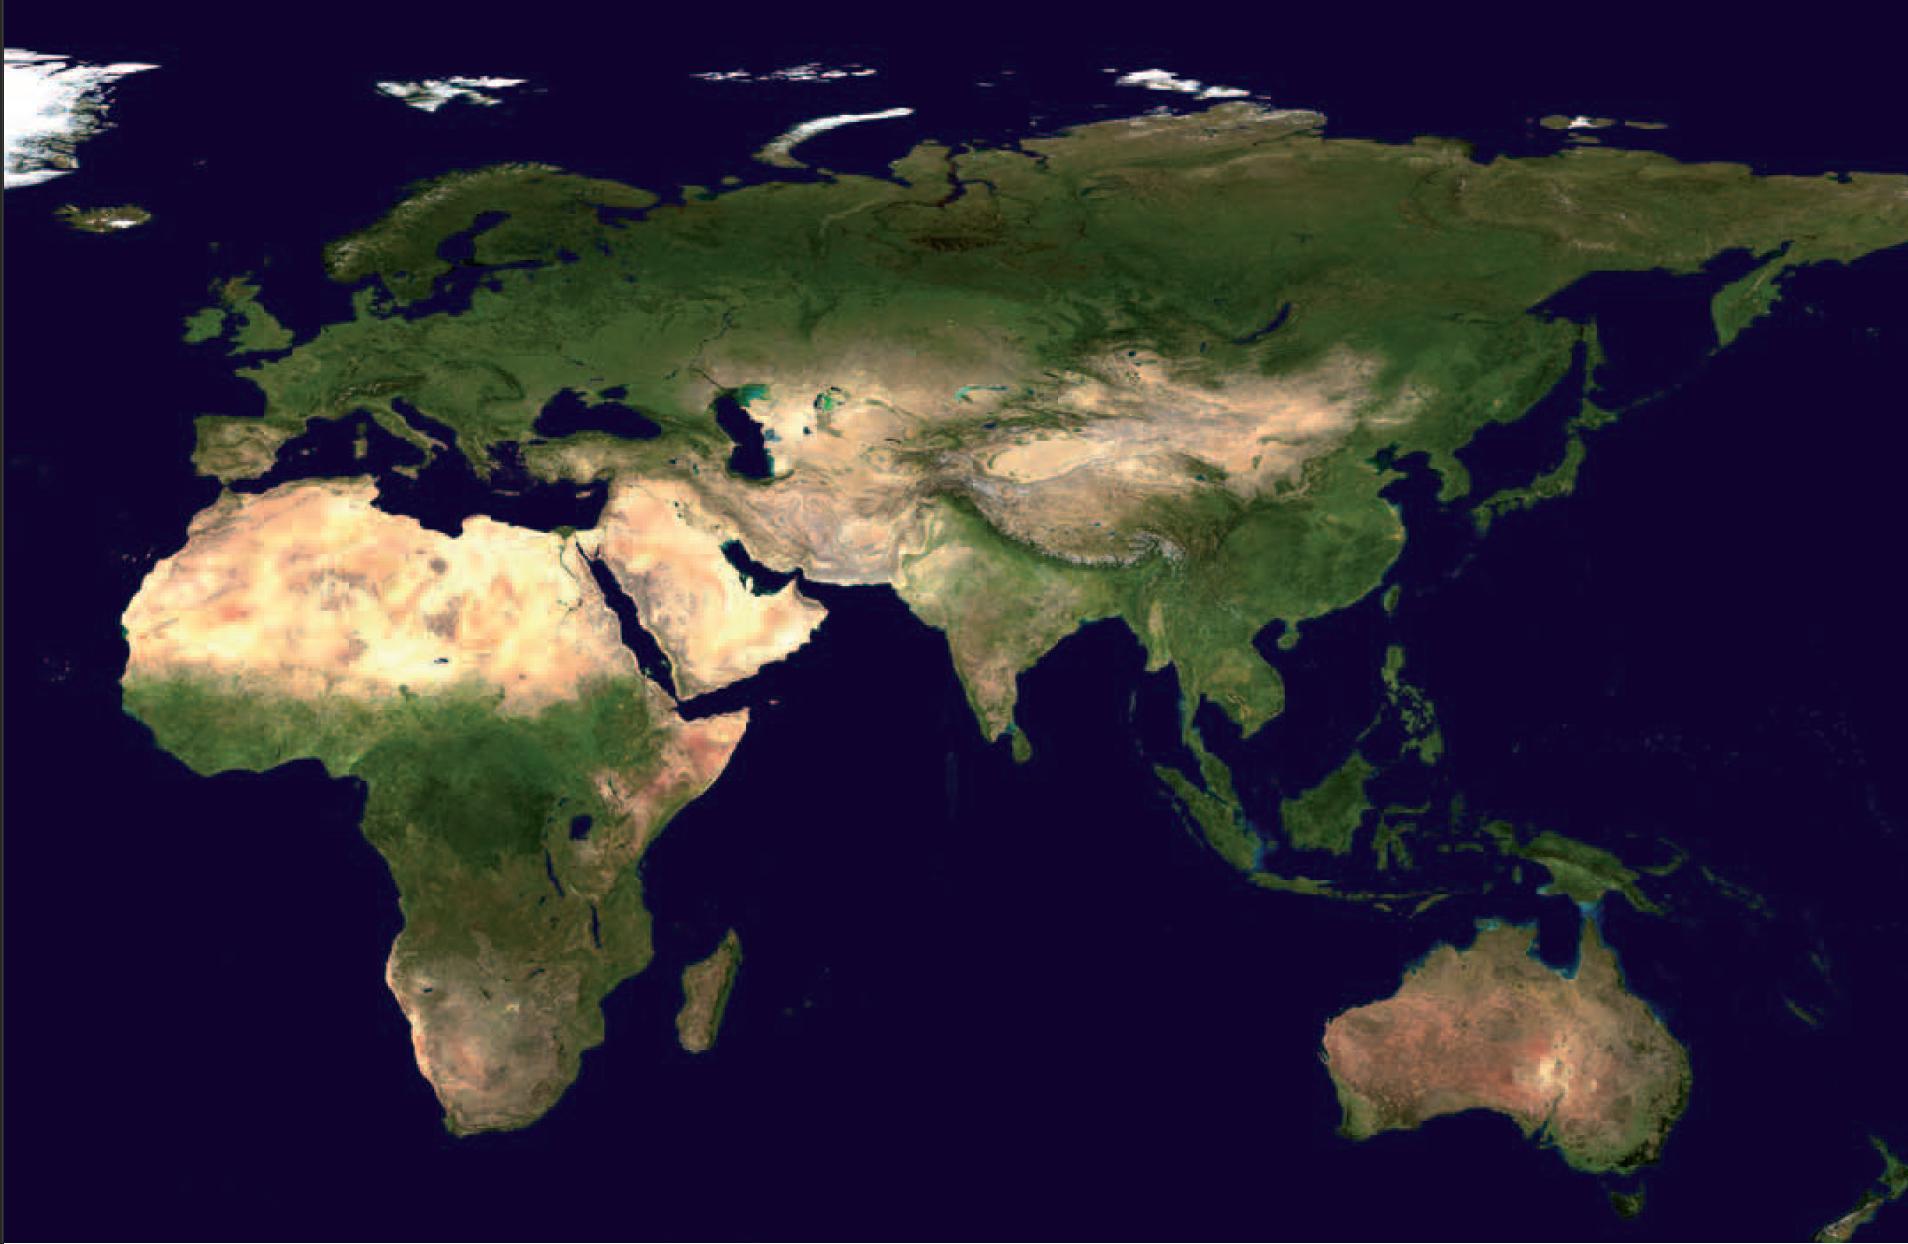 Figure 3 - Image satellitaire provenant du site           http://visibleearth.nasa.gov